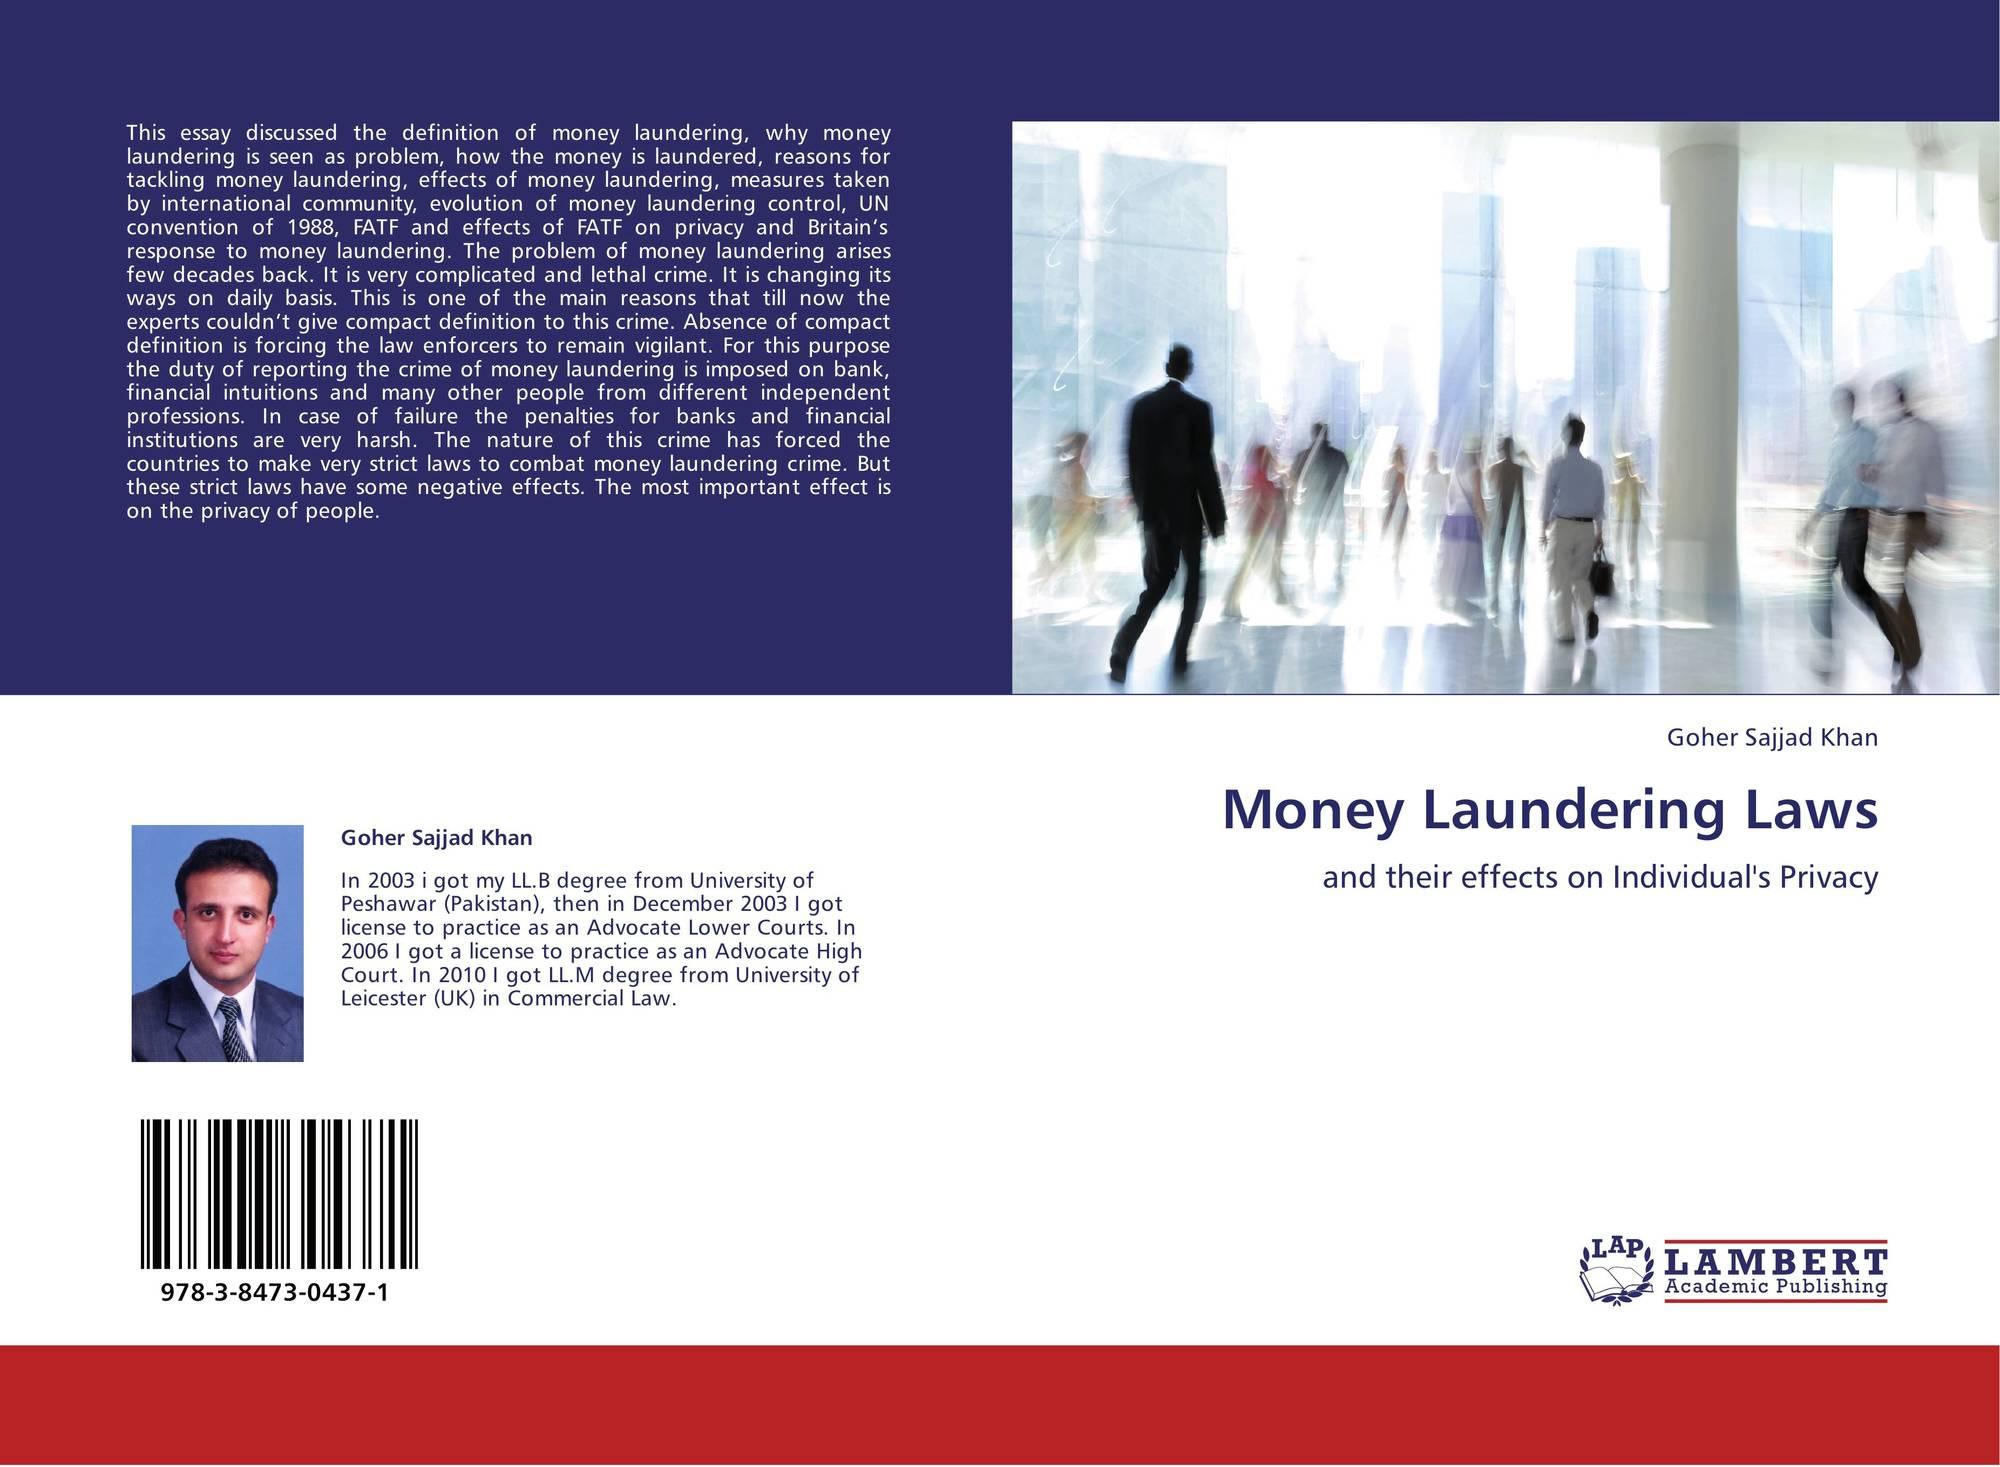 Search anti money laundering Jobs | Robert Half